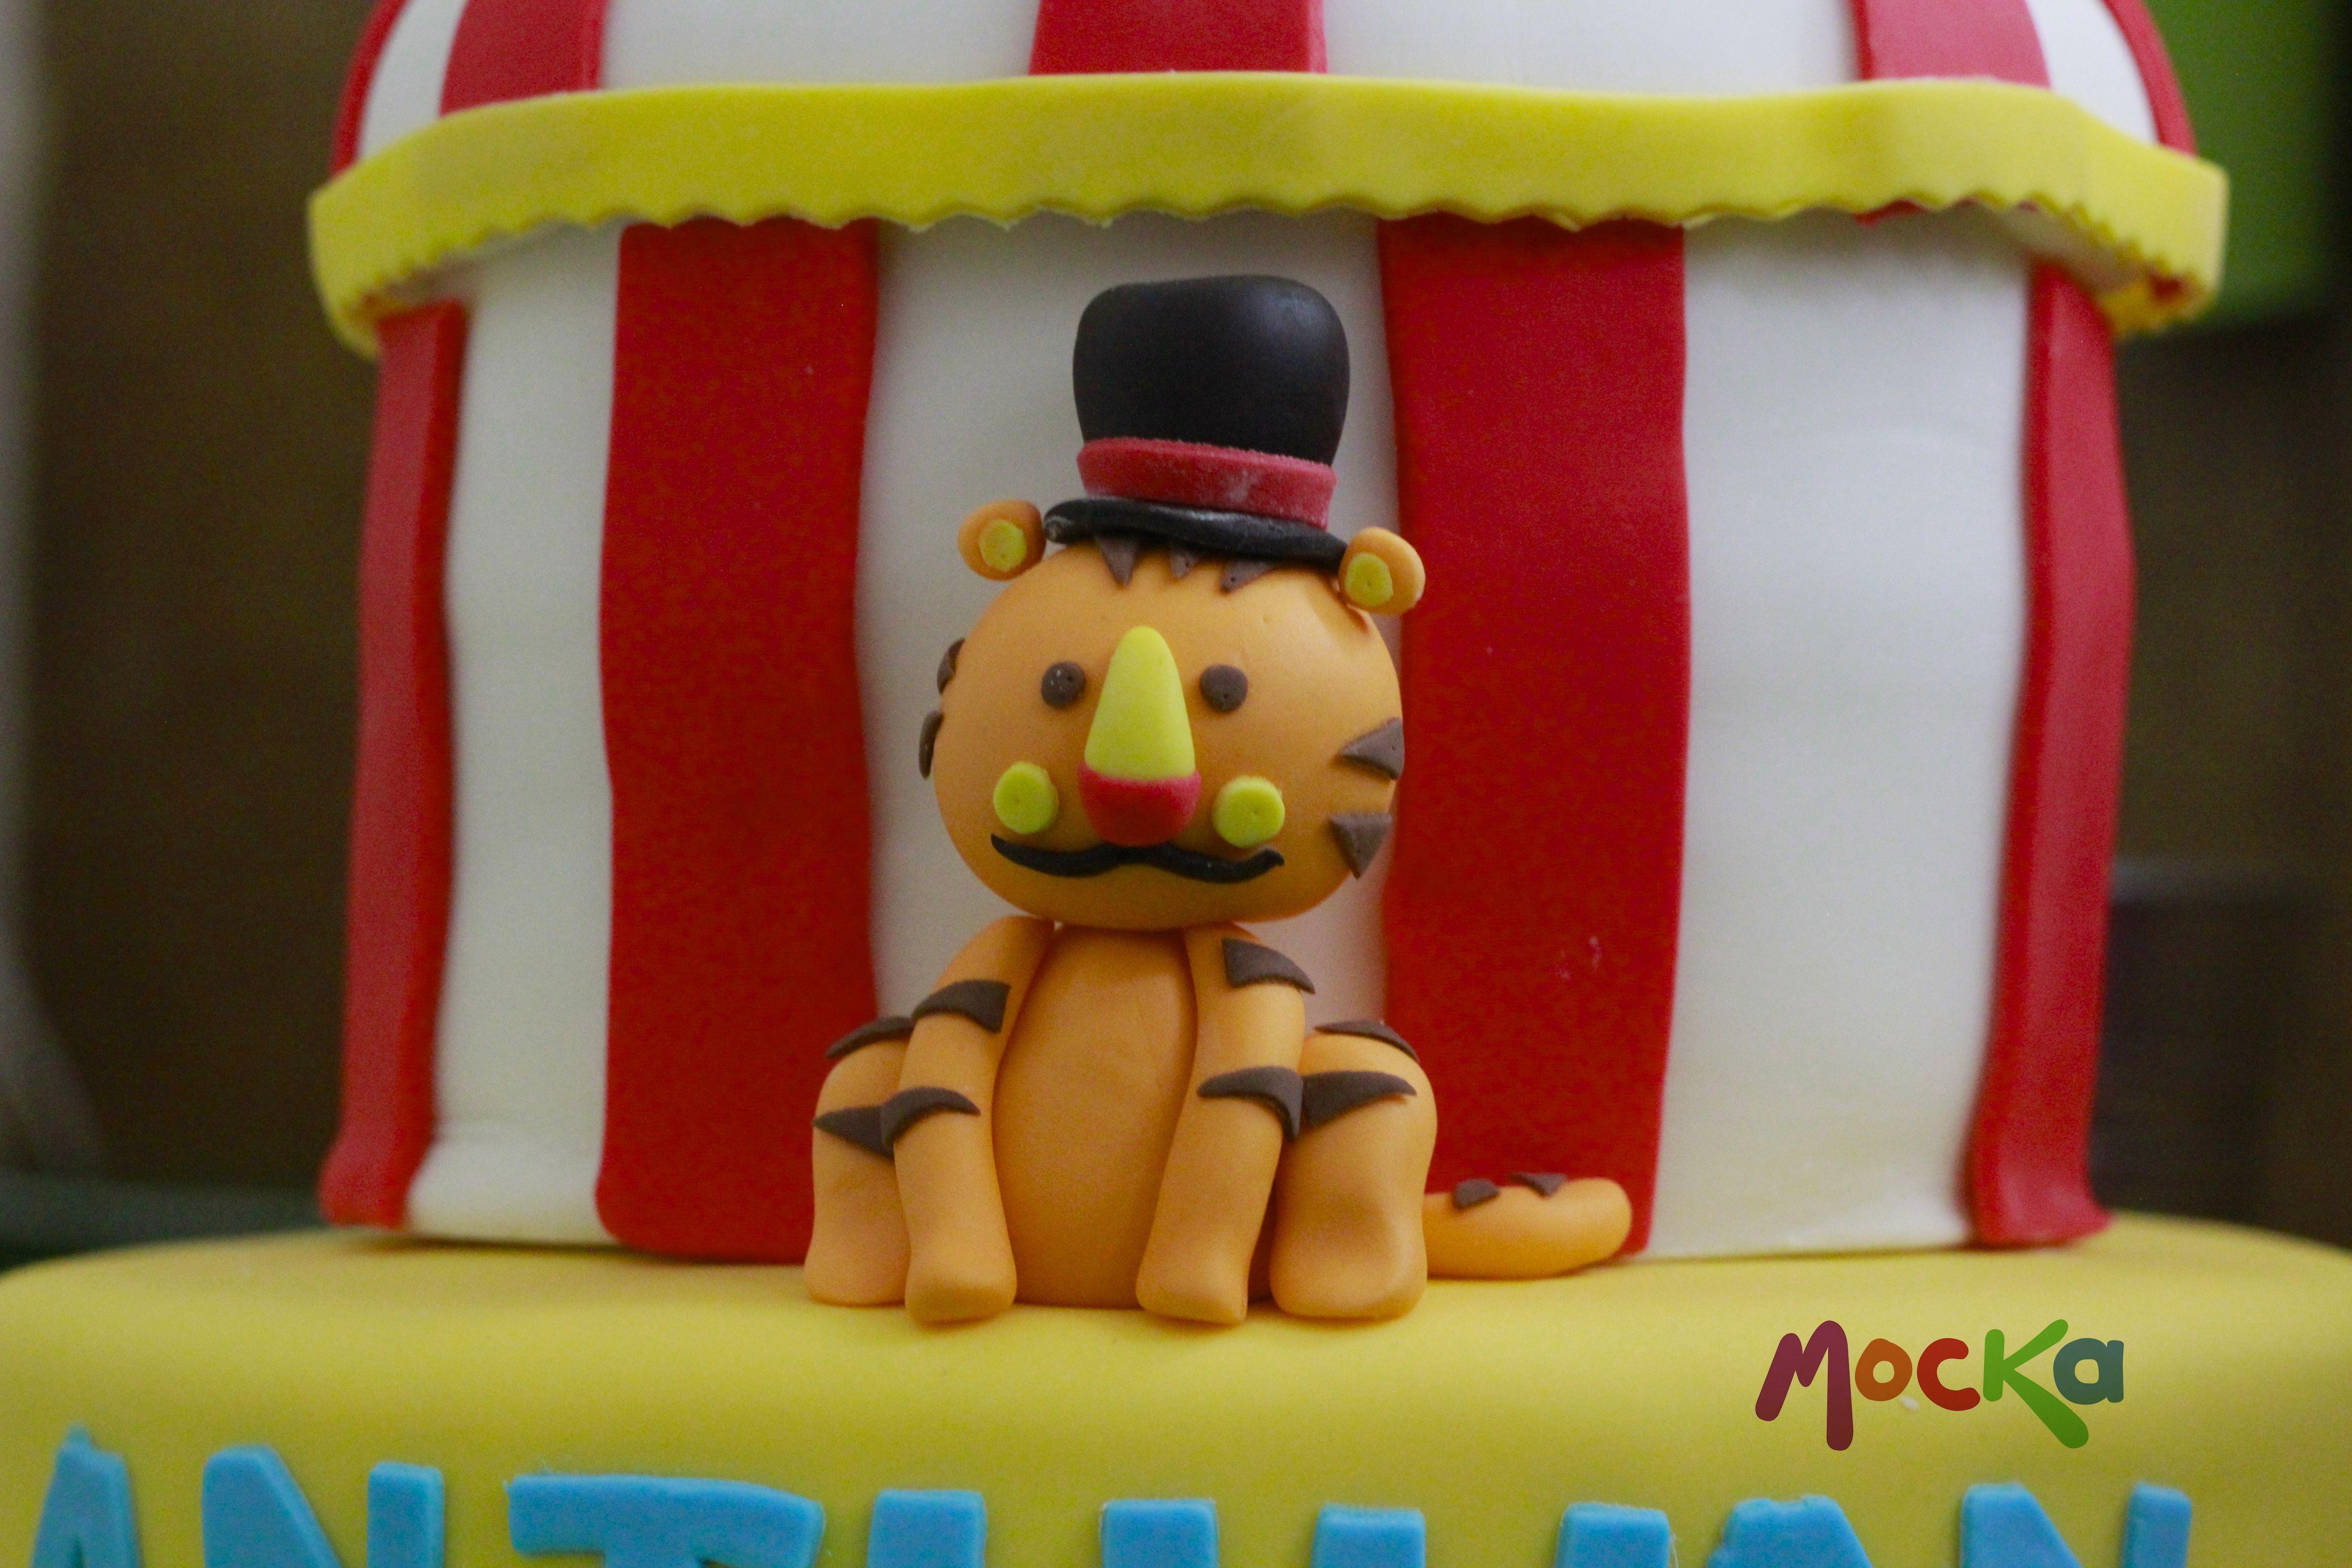 Vamos al #Circo!!!  www.mocka.co  #mocka #pasteleria #cake #cakeshop #circus #tortainfantil #circuscake #torta #ponque